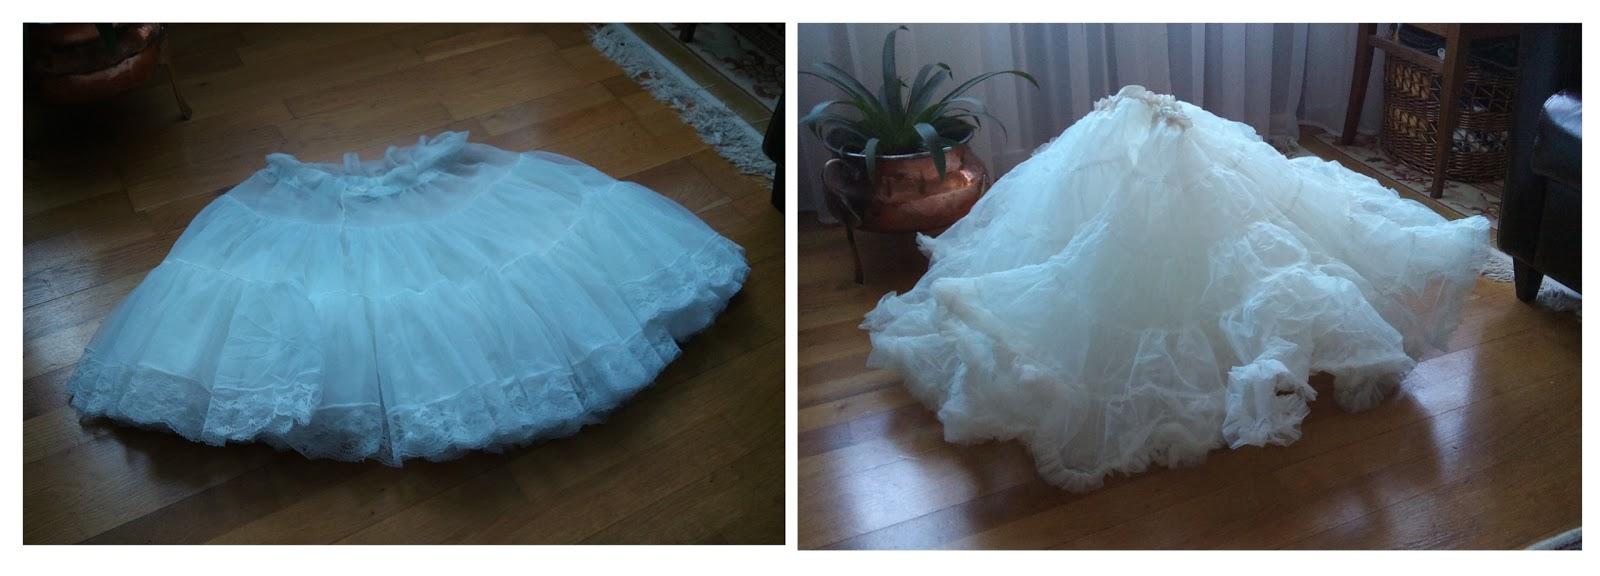 titta under kjolen